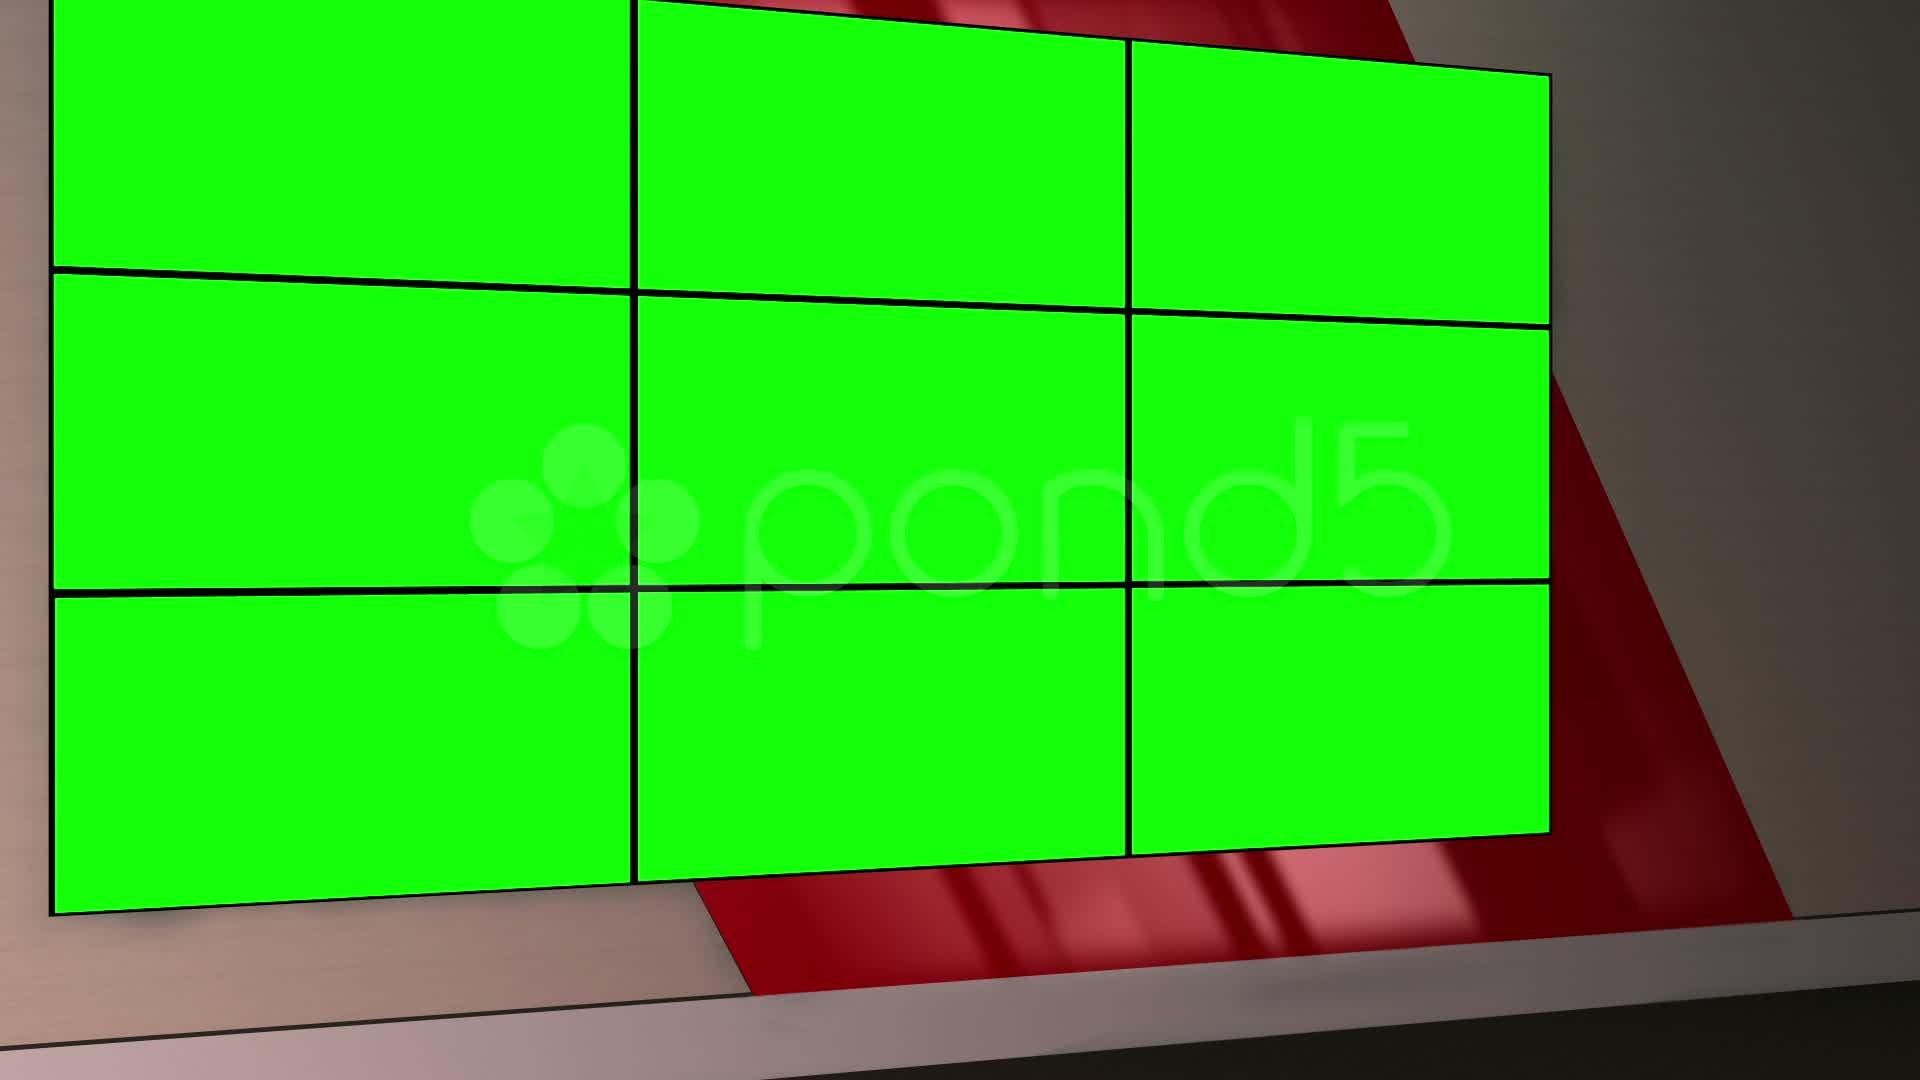 ... Virtual Set 12 - Standing Newsroom Studio Background Shot ~ #20482019